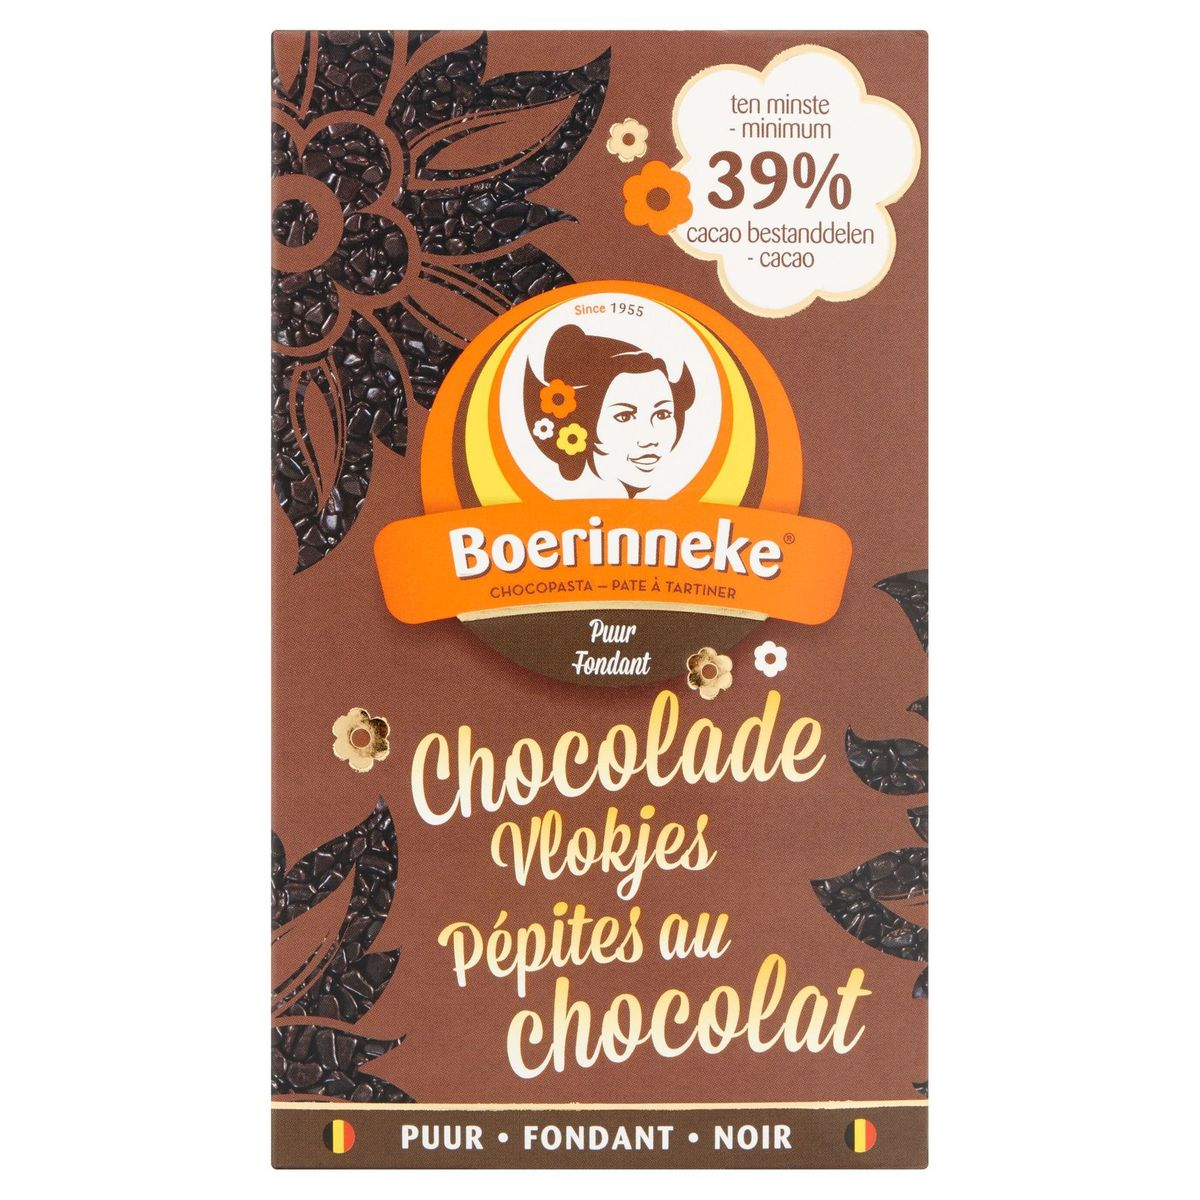 Boerinneke Chocolade Vlokjes Puur Fondant 350 g